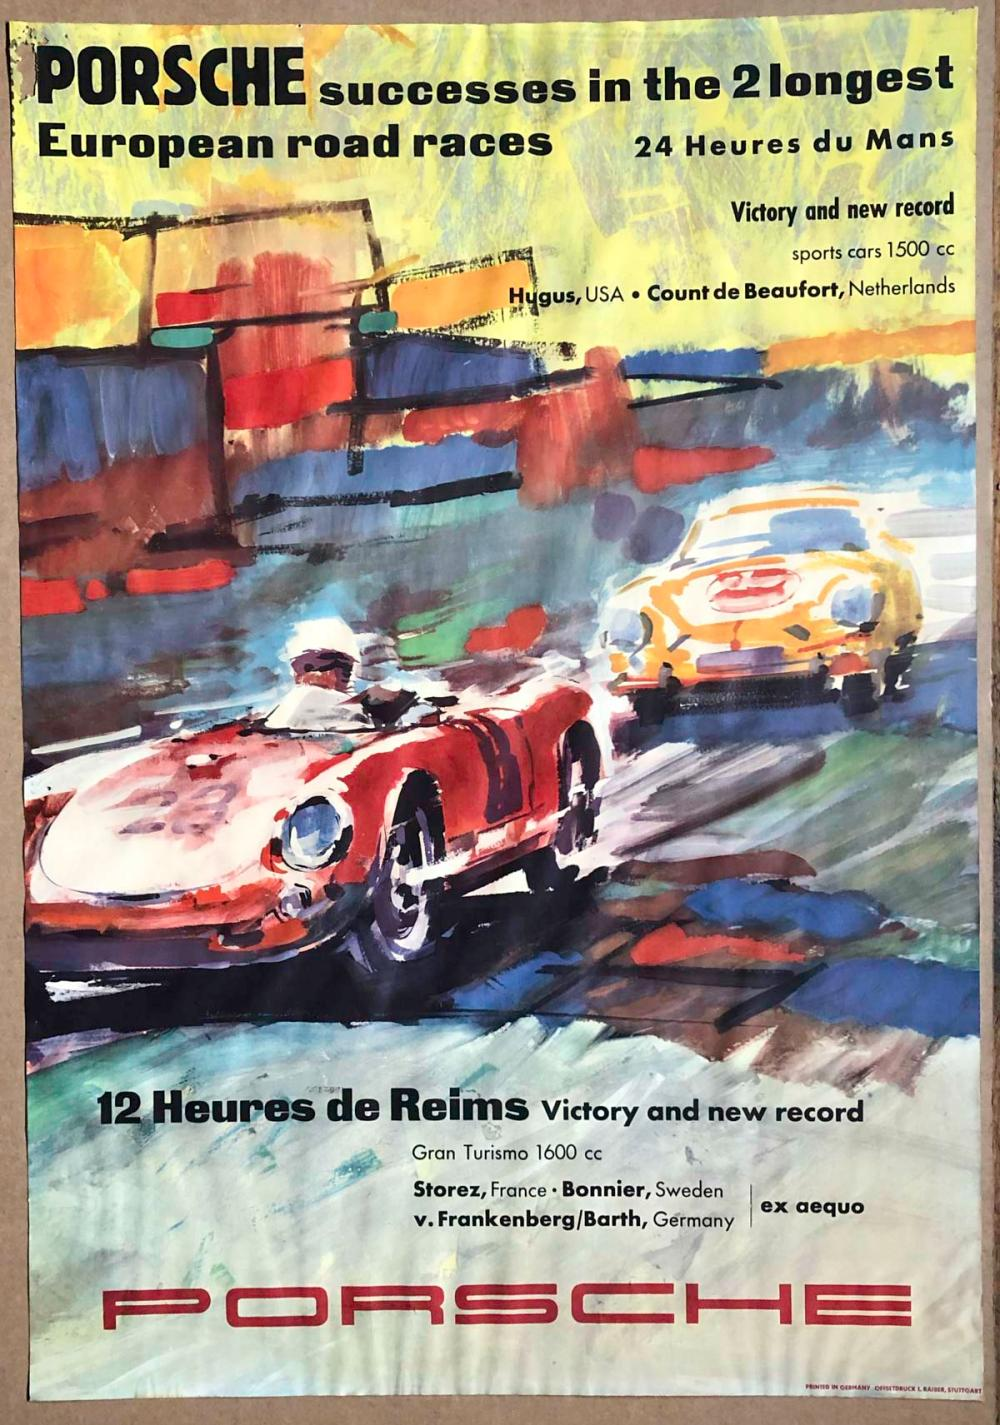 Original 1950's Porsche victory poster